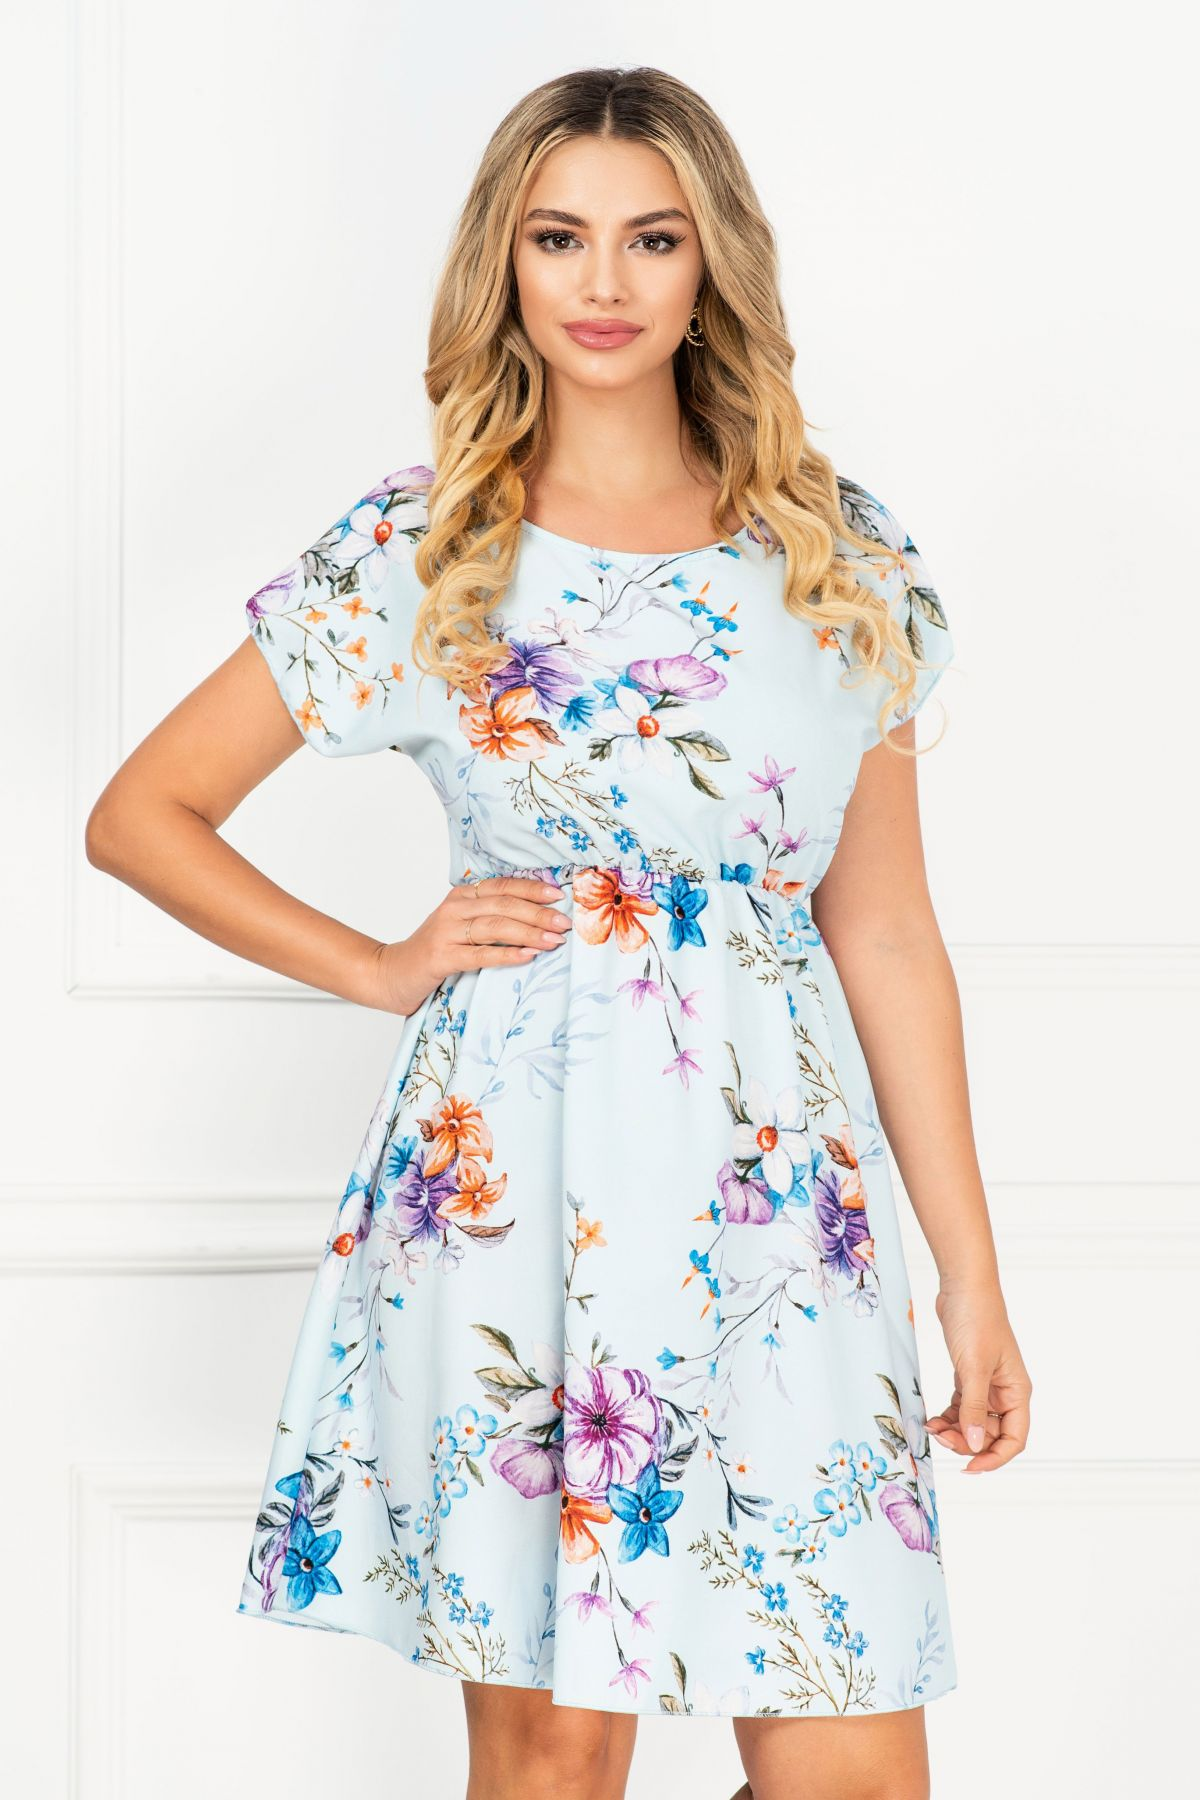 Rochie bleu ciel de vara vaporoasa cu print floral